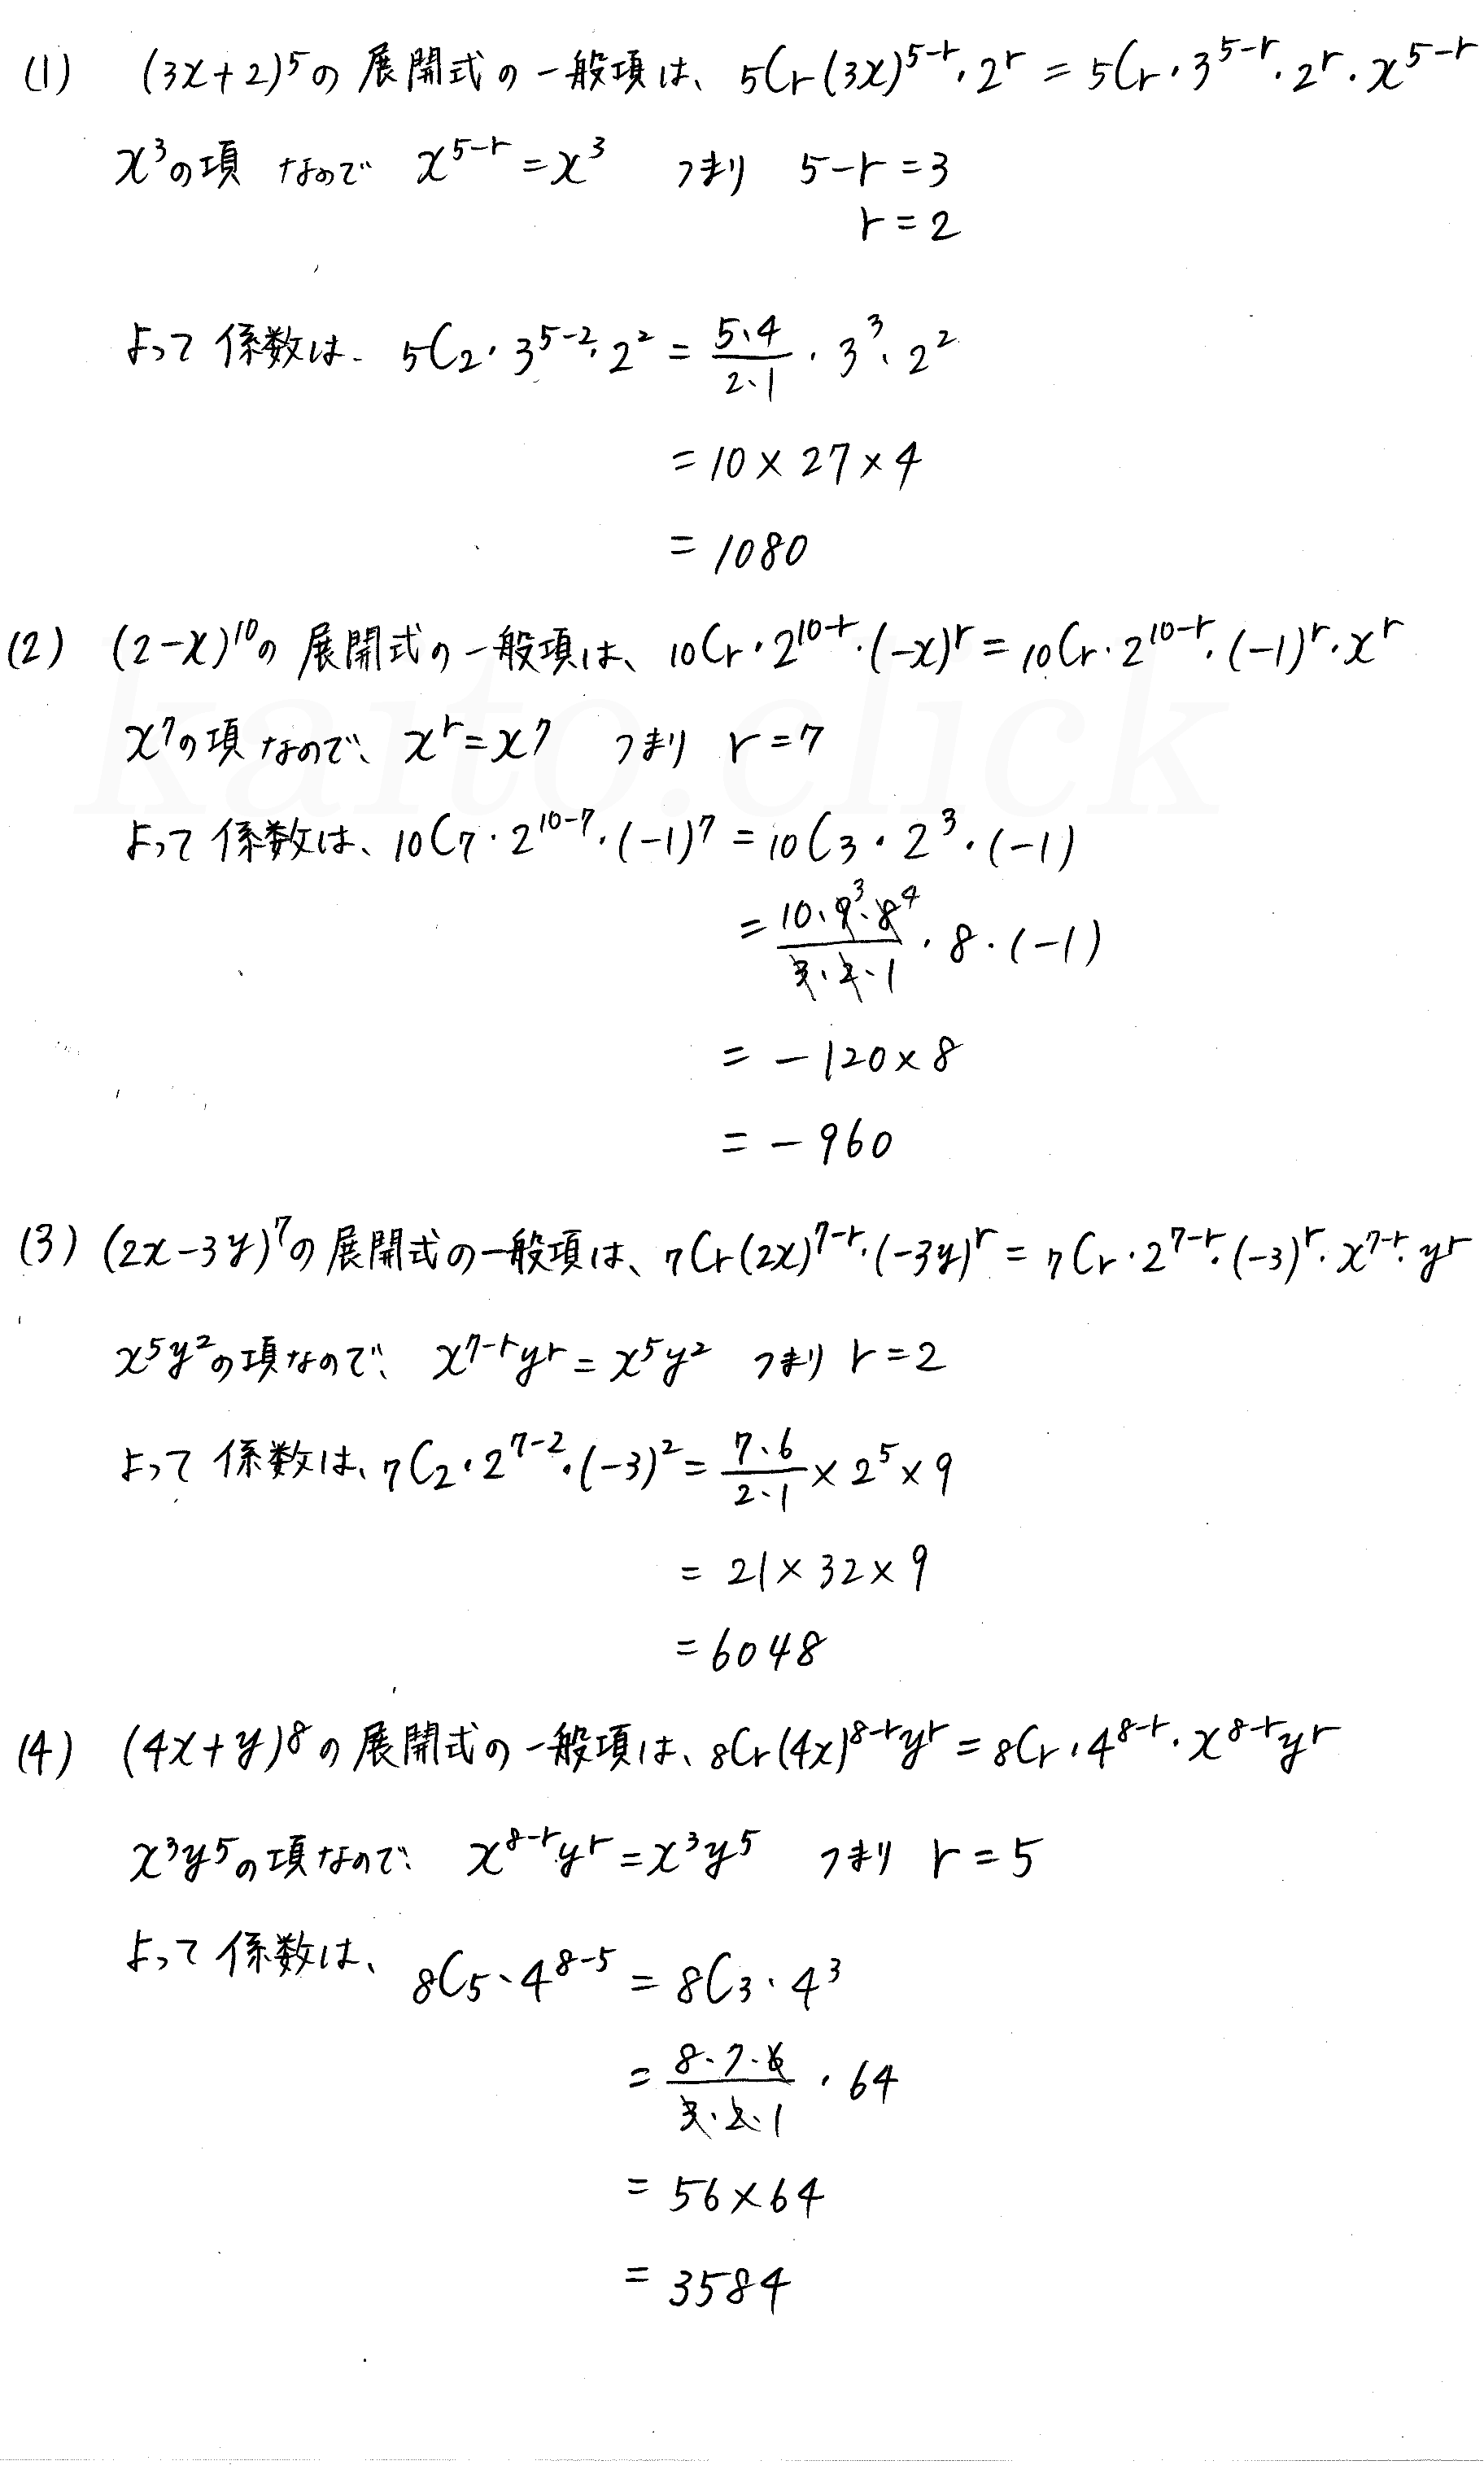 3TRIAL数学2-9解答